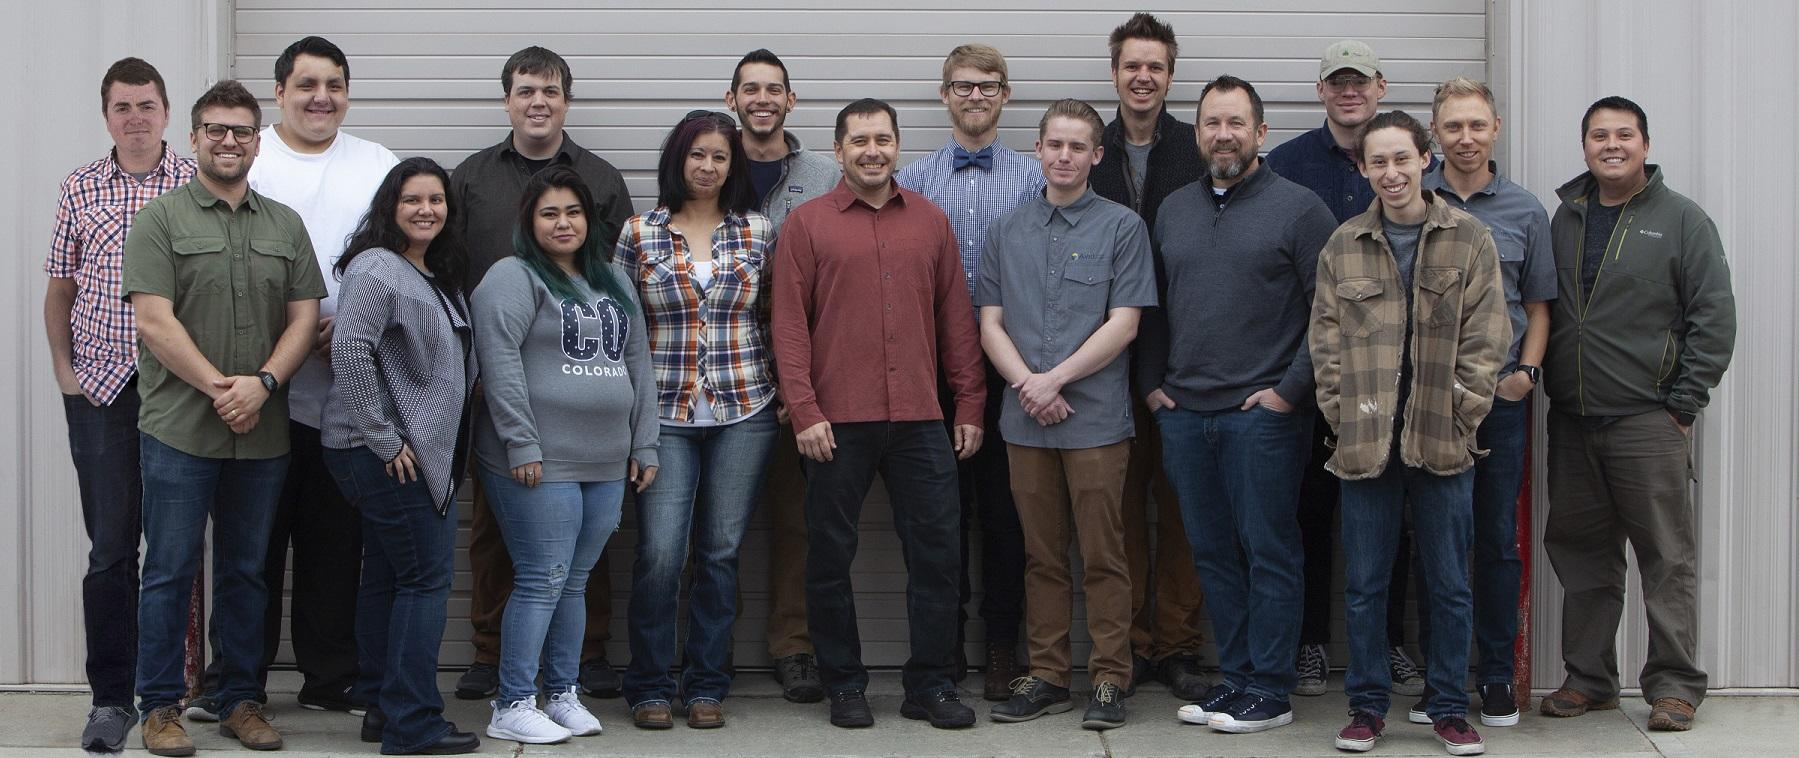 Avid Product Development Group Photo